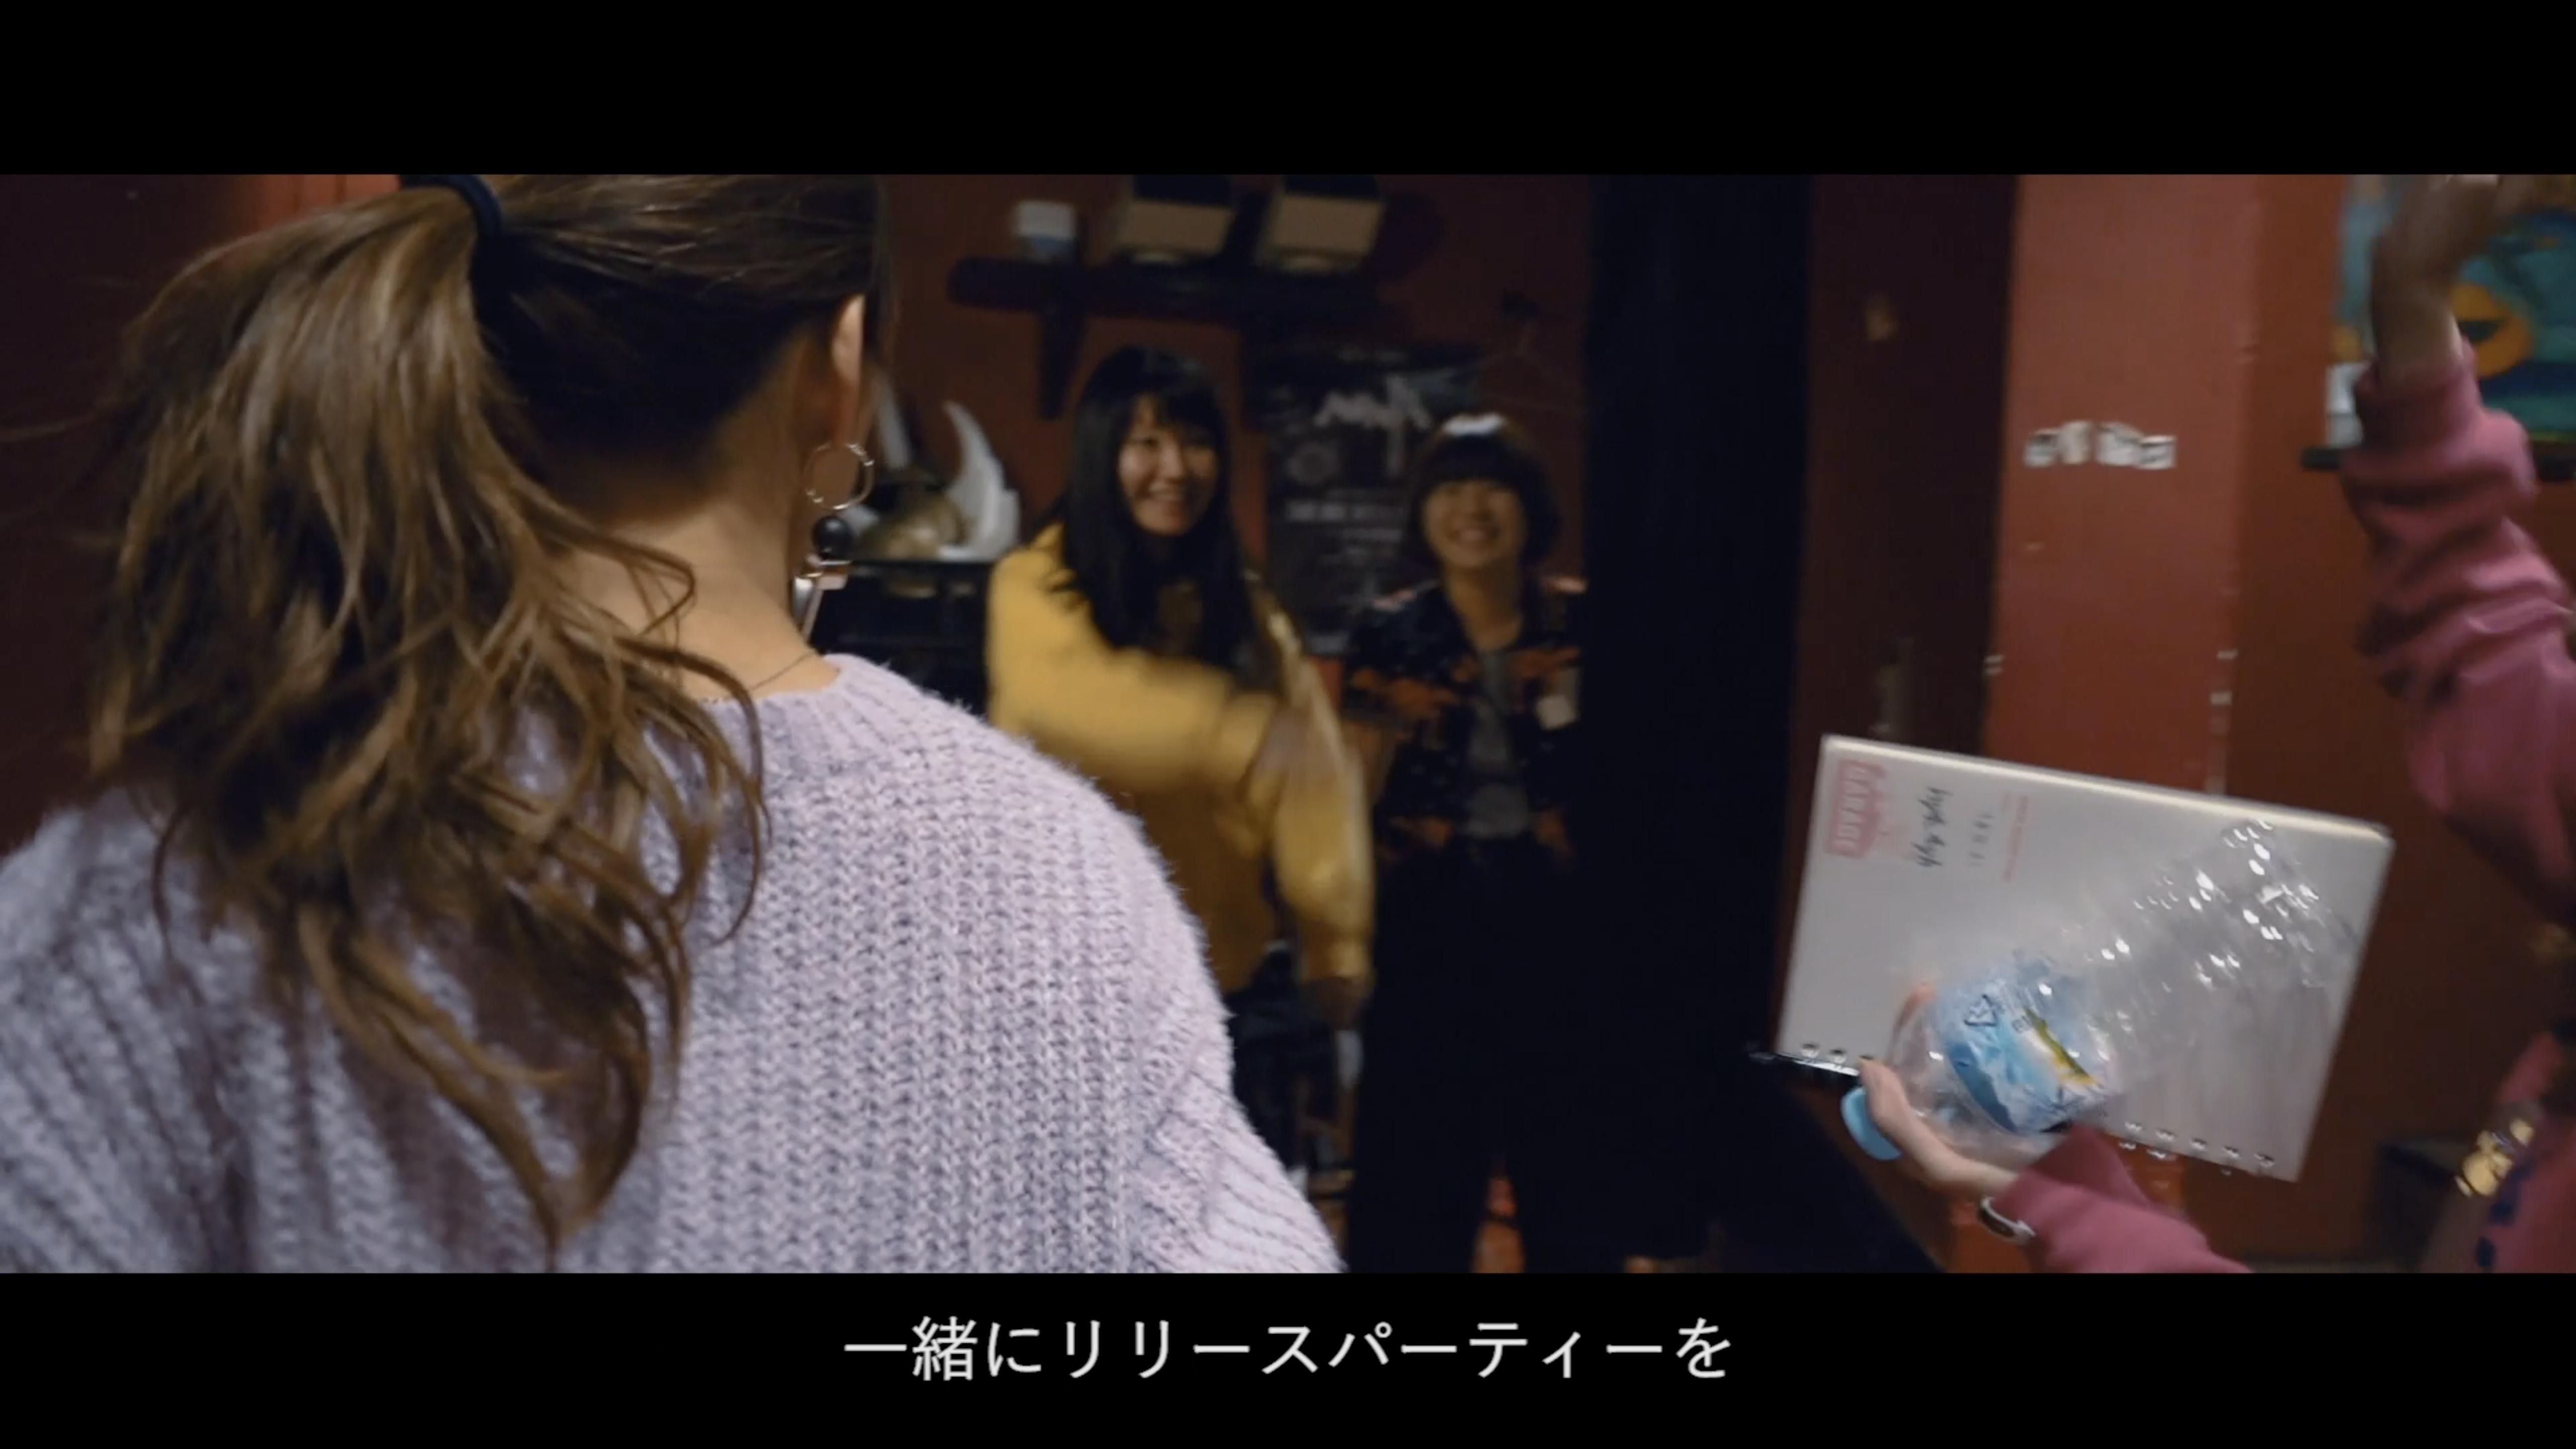 hy4_4yh(ハイパーヨーヨ)ドキュメンタリー第6話 画像01